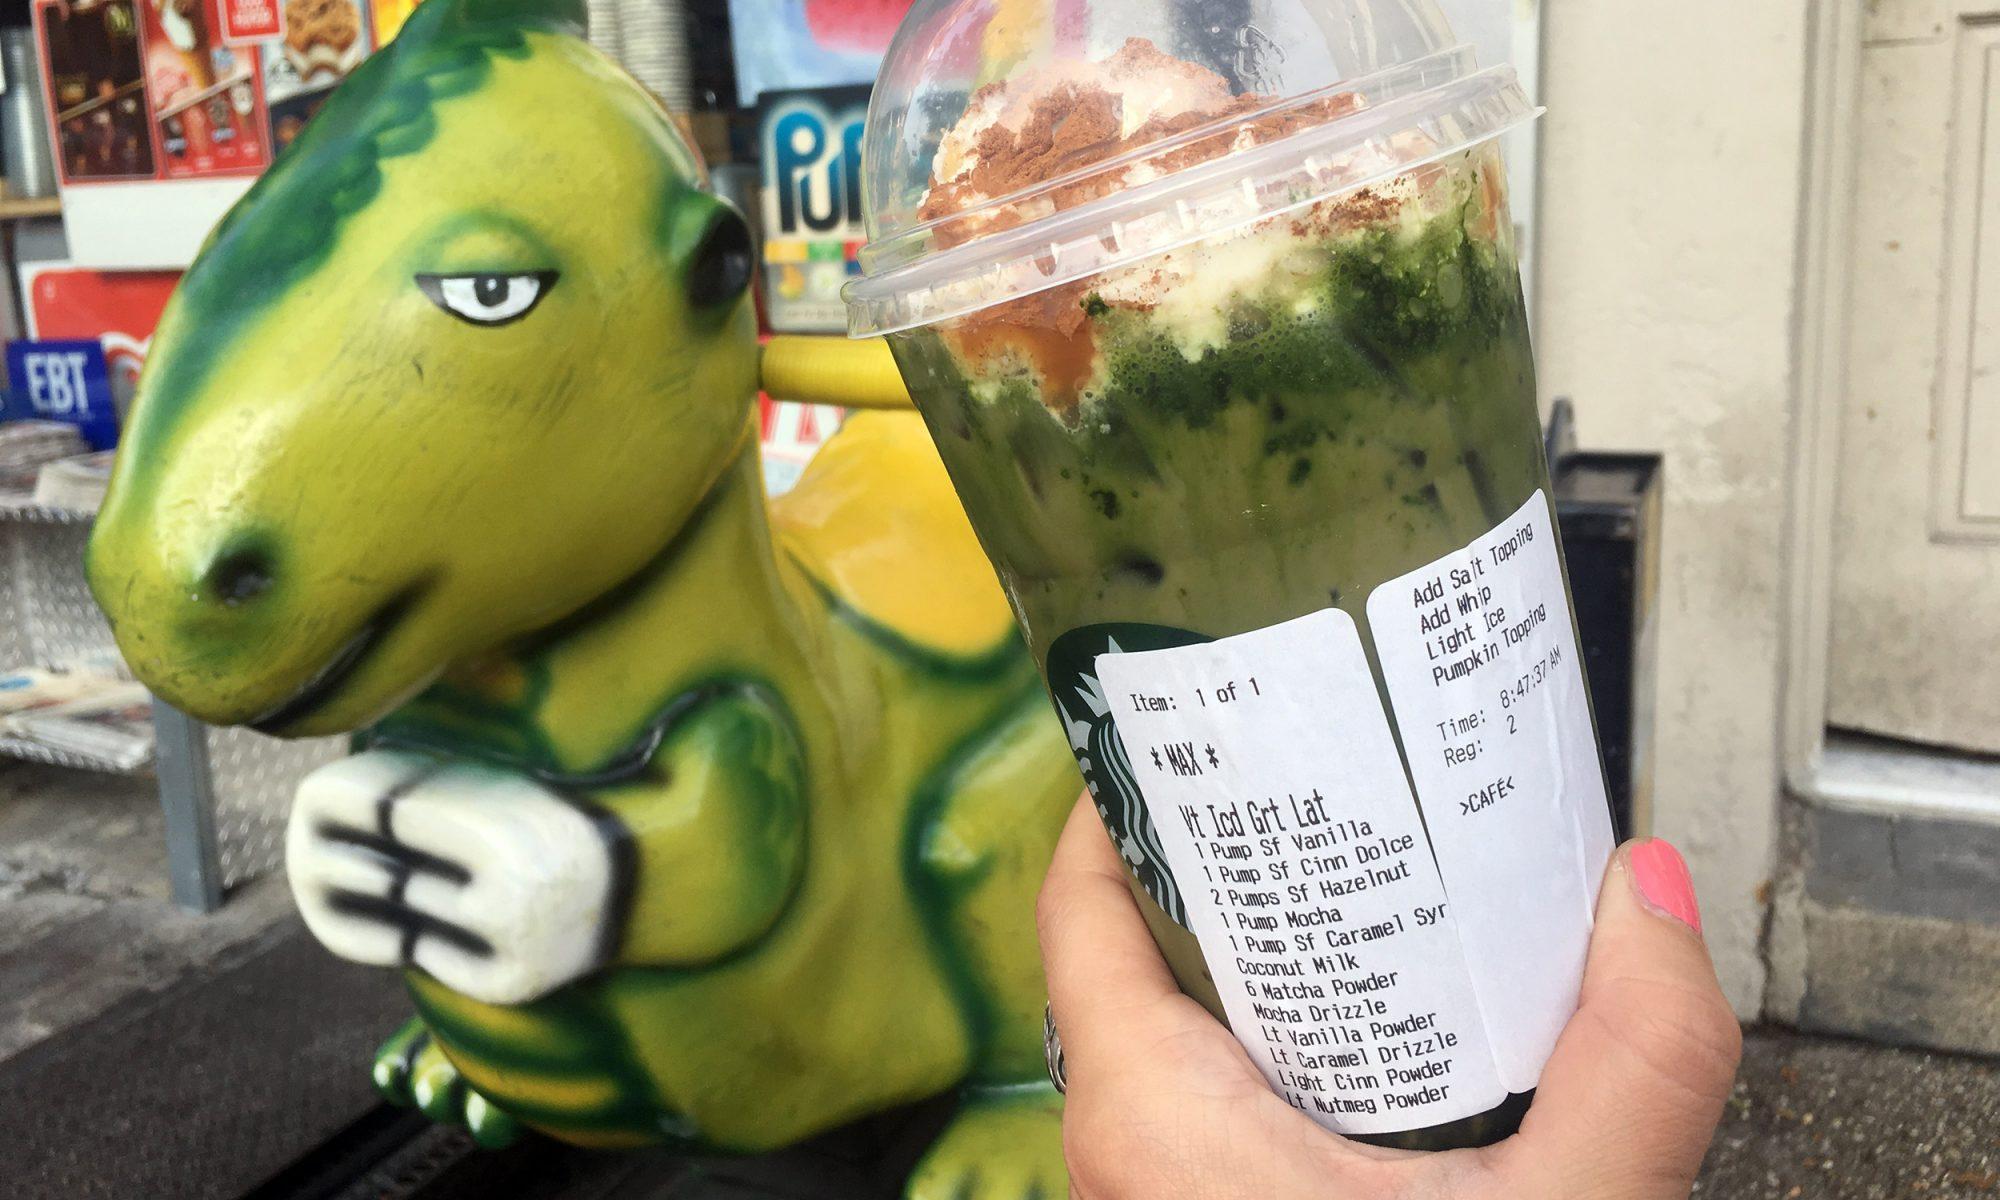 EC: We Tasted Baby Vomit, the New Secret Starbucks Drink